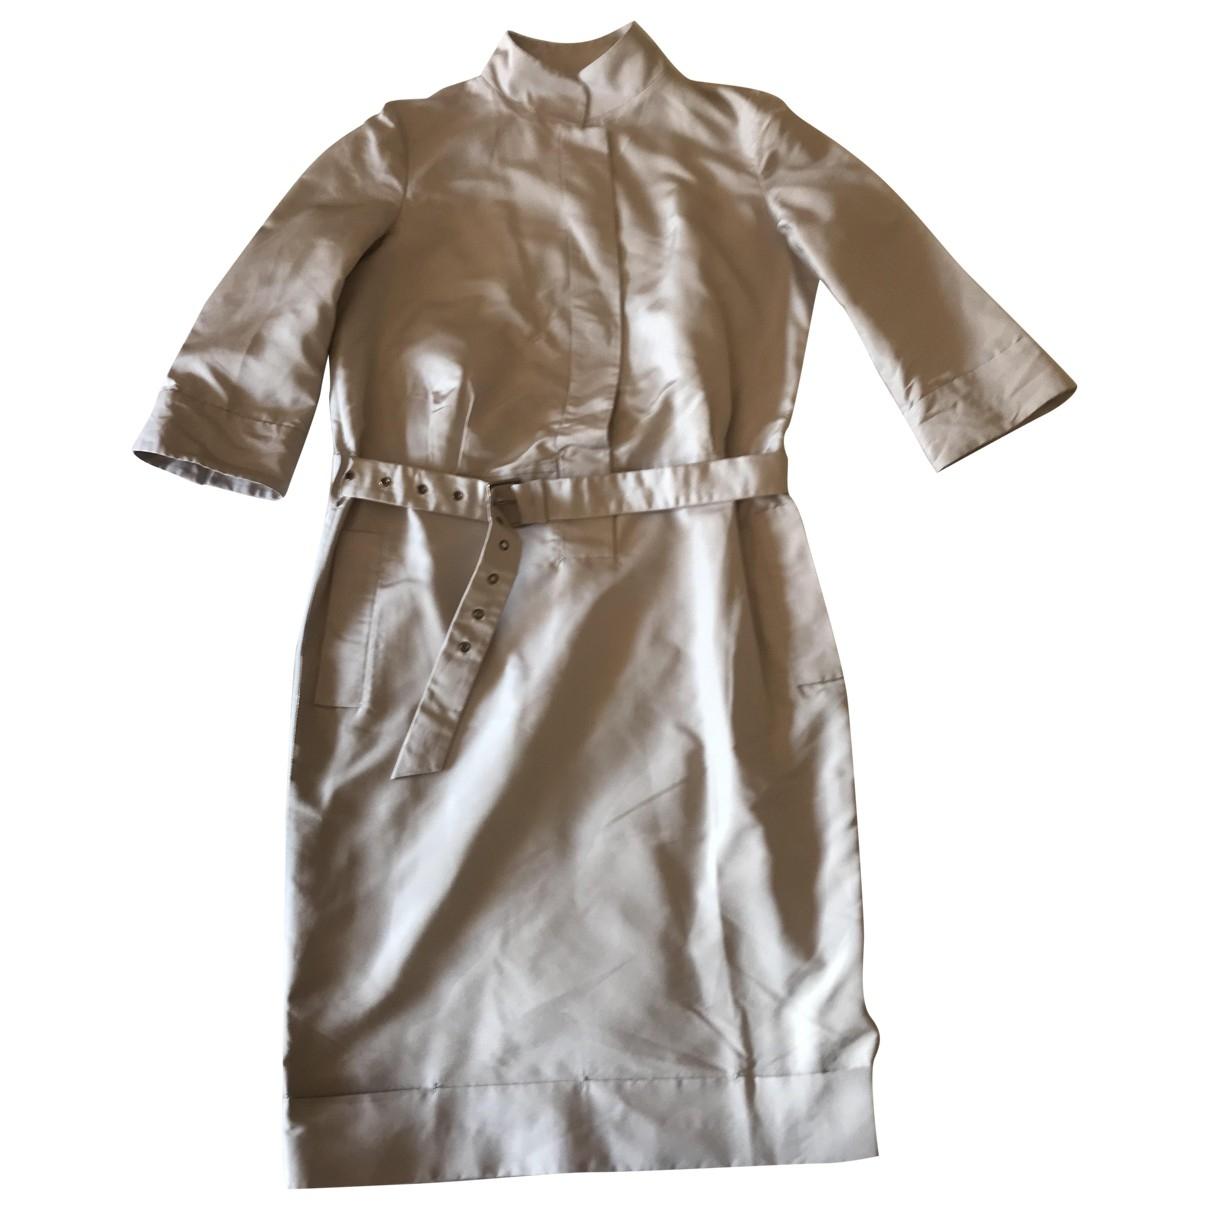 Salvatore Ferragamo \N Kleid in  Beige Seide